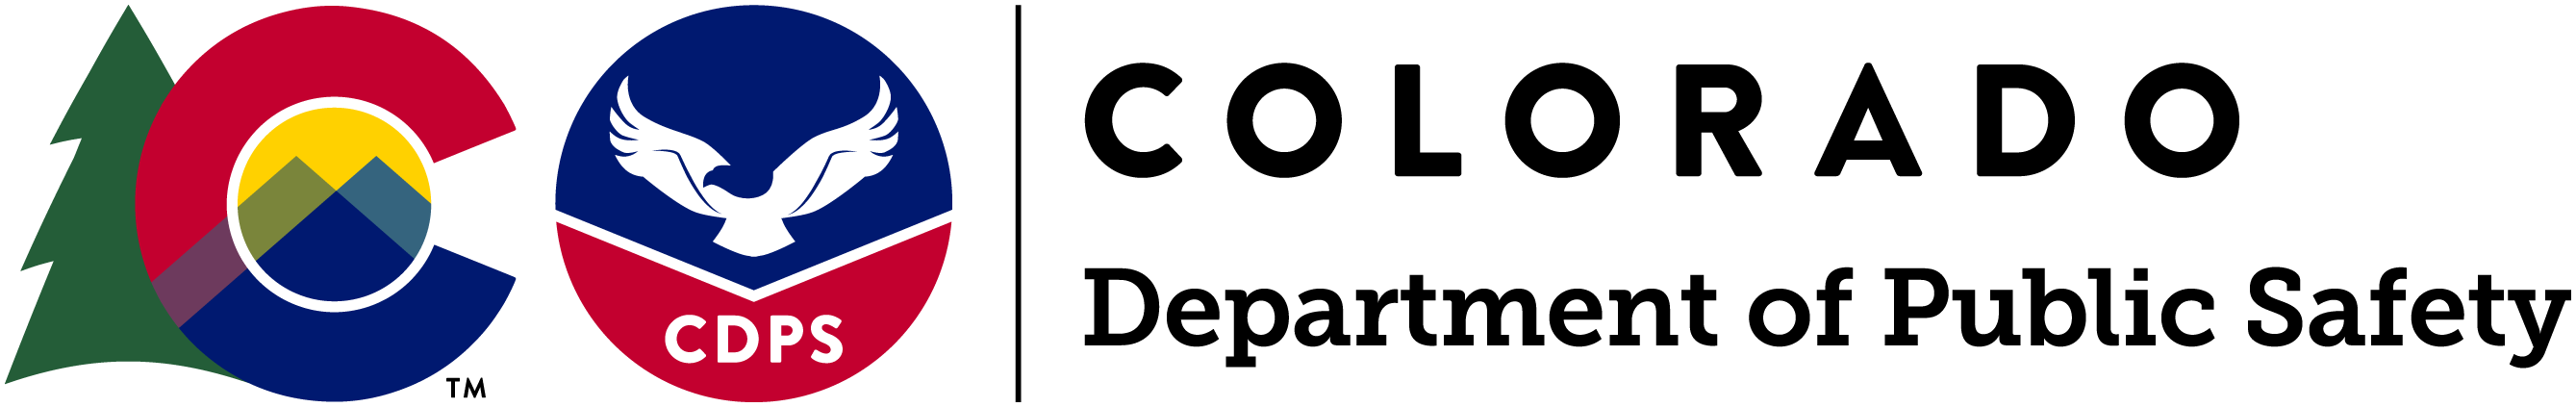 CDPS UAV Site